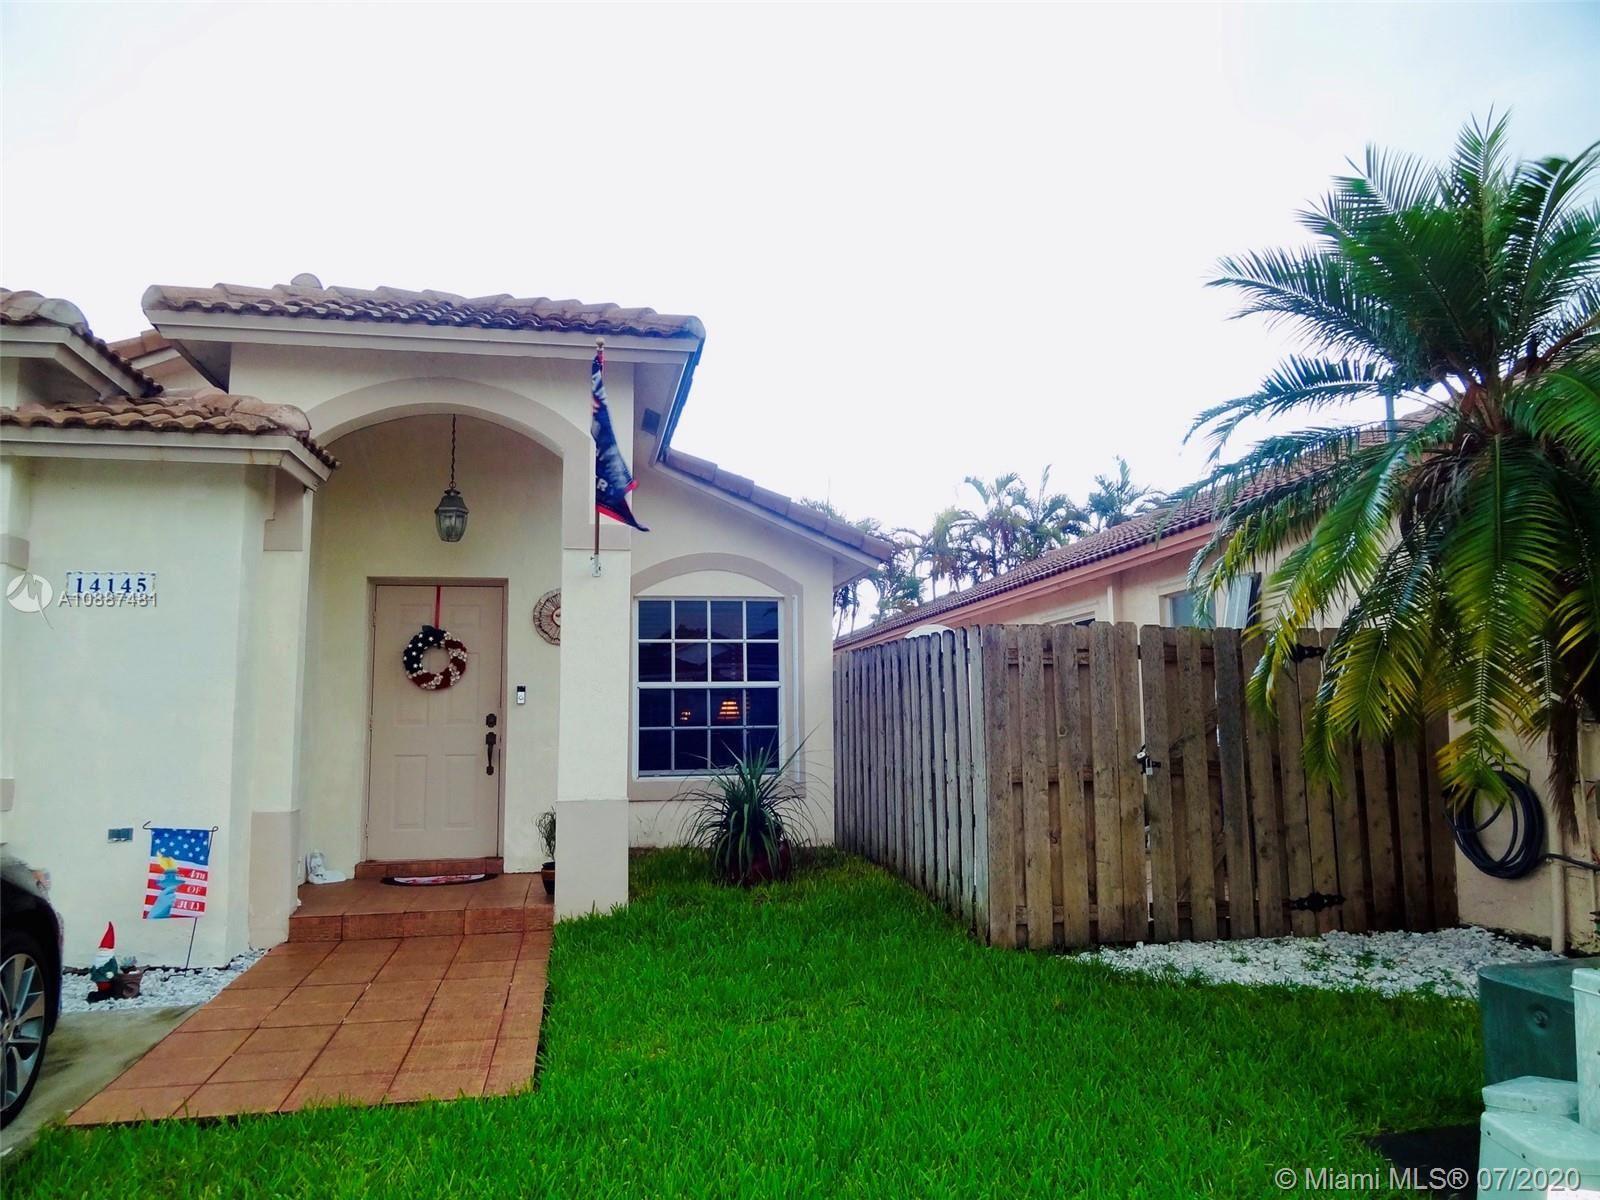 14145 SW 149 Pl, Miami, FL 33196 - #: A10887481